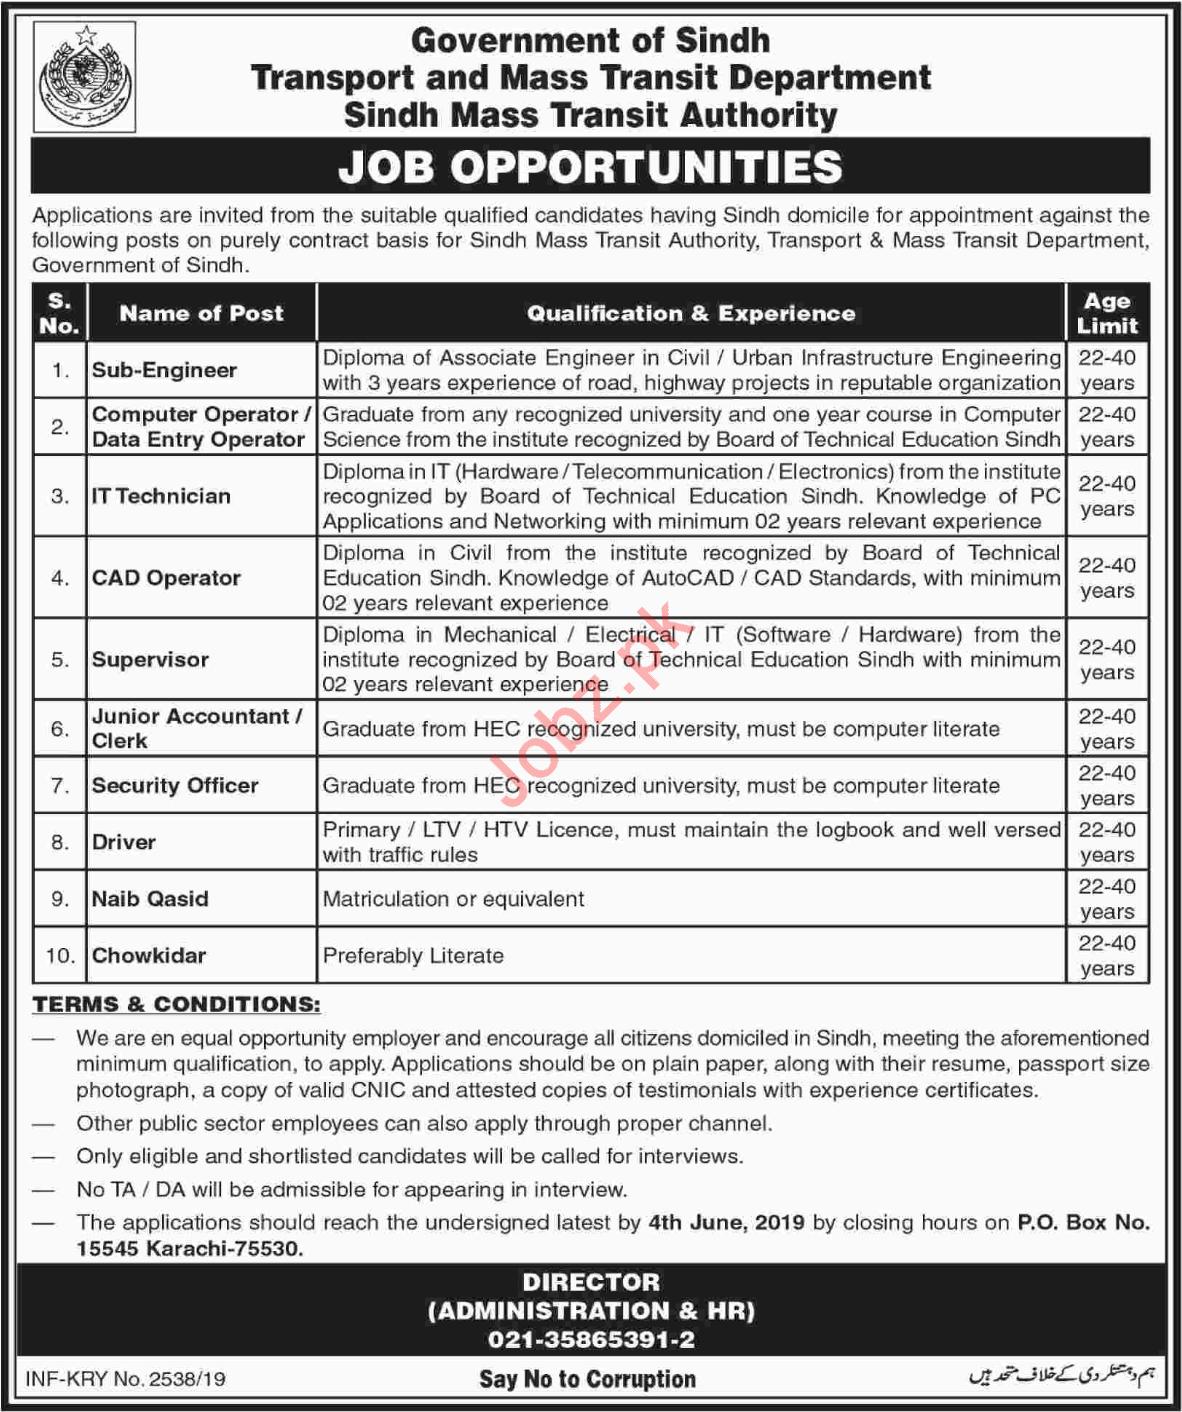 Jobs In Transguard & Mass Transit Department Sindh 16 May